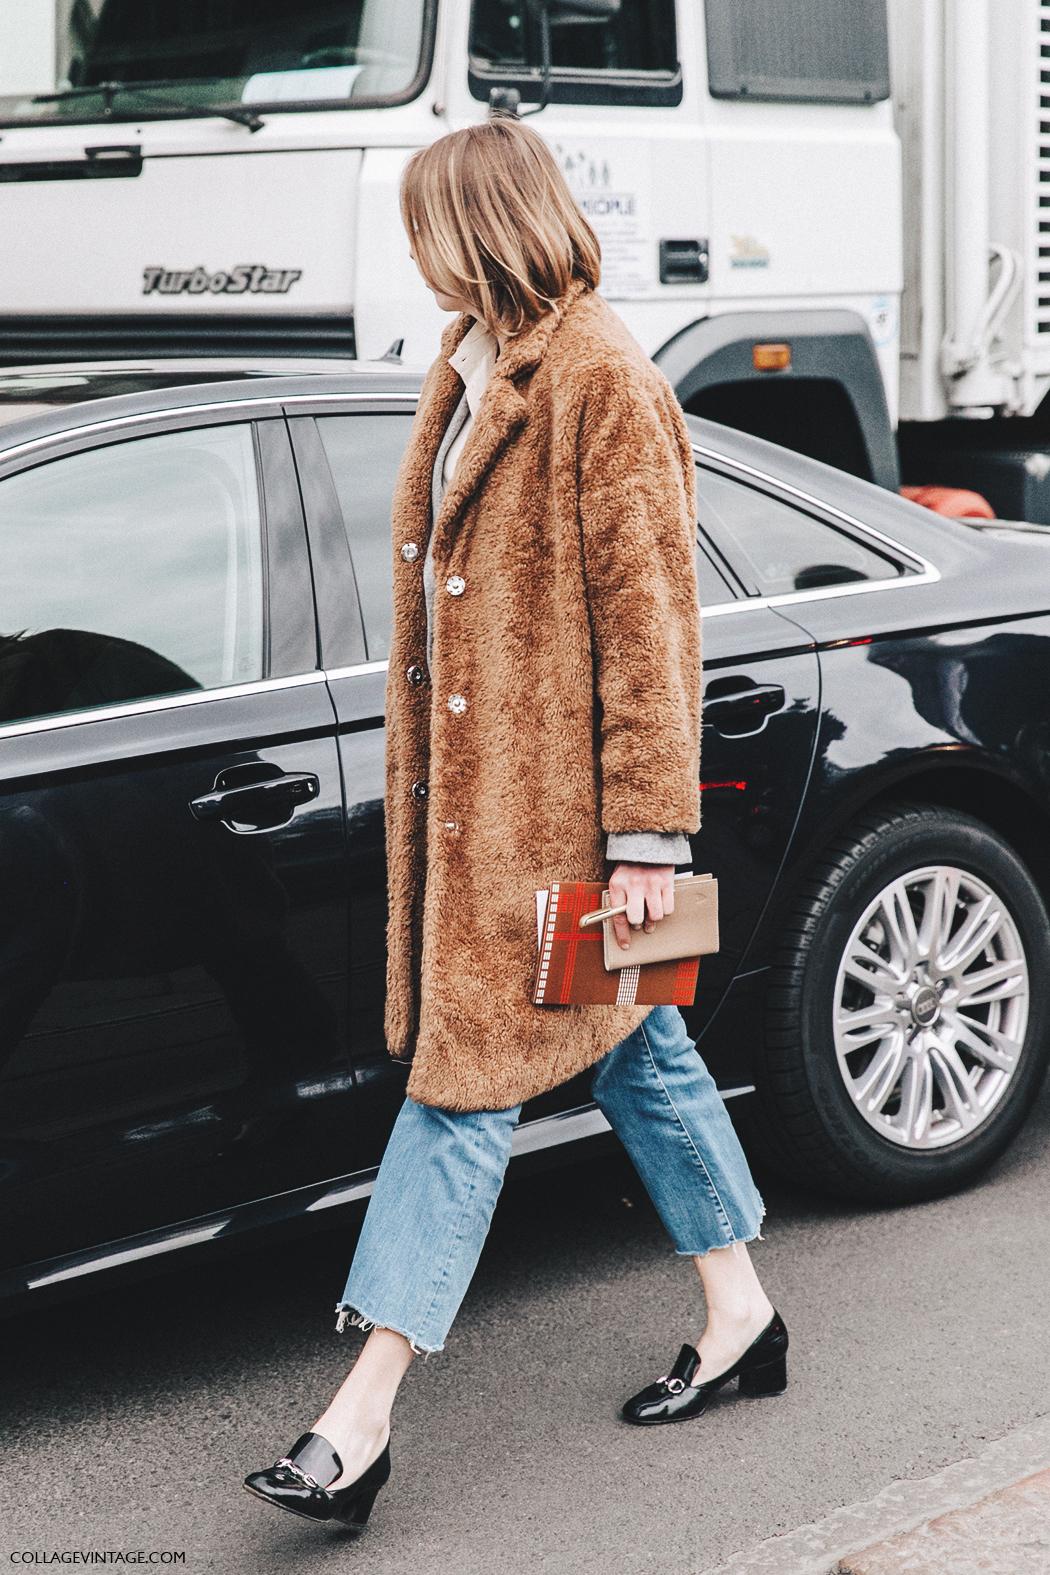 Milan_Fashion_Week_Fall_16-MFW-Street_Style-Collage_Vintage-Gucci_Shoes-Fur_coat-1